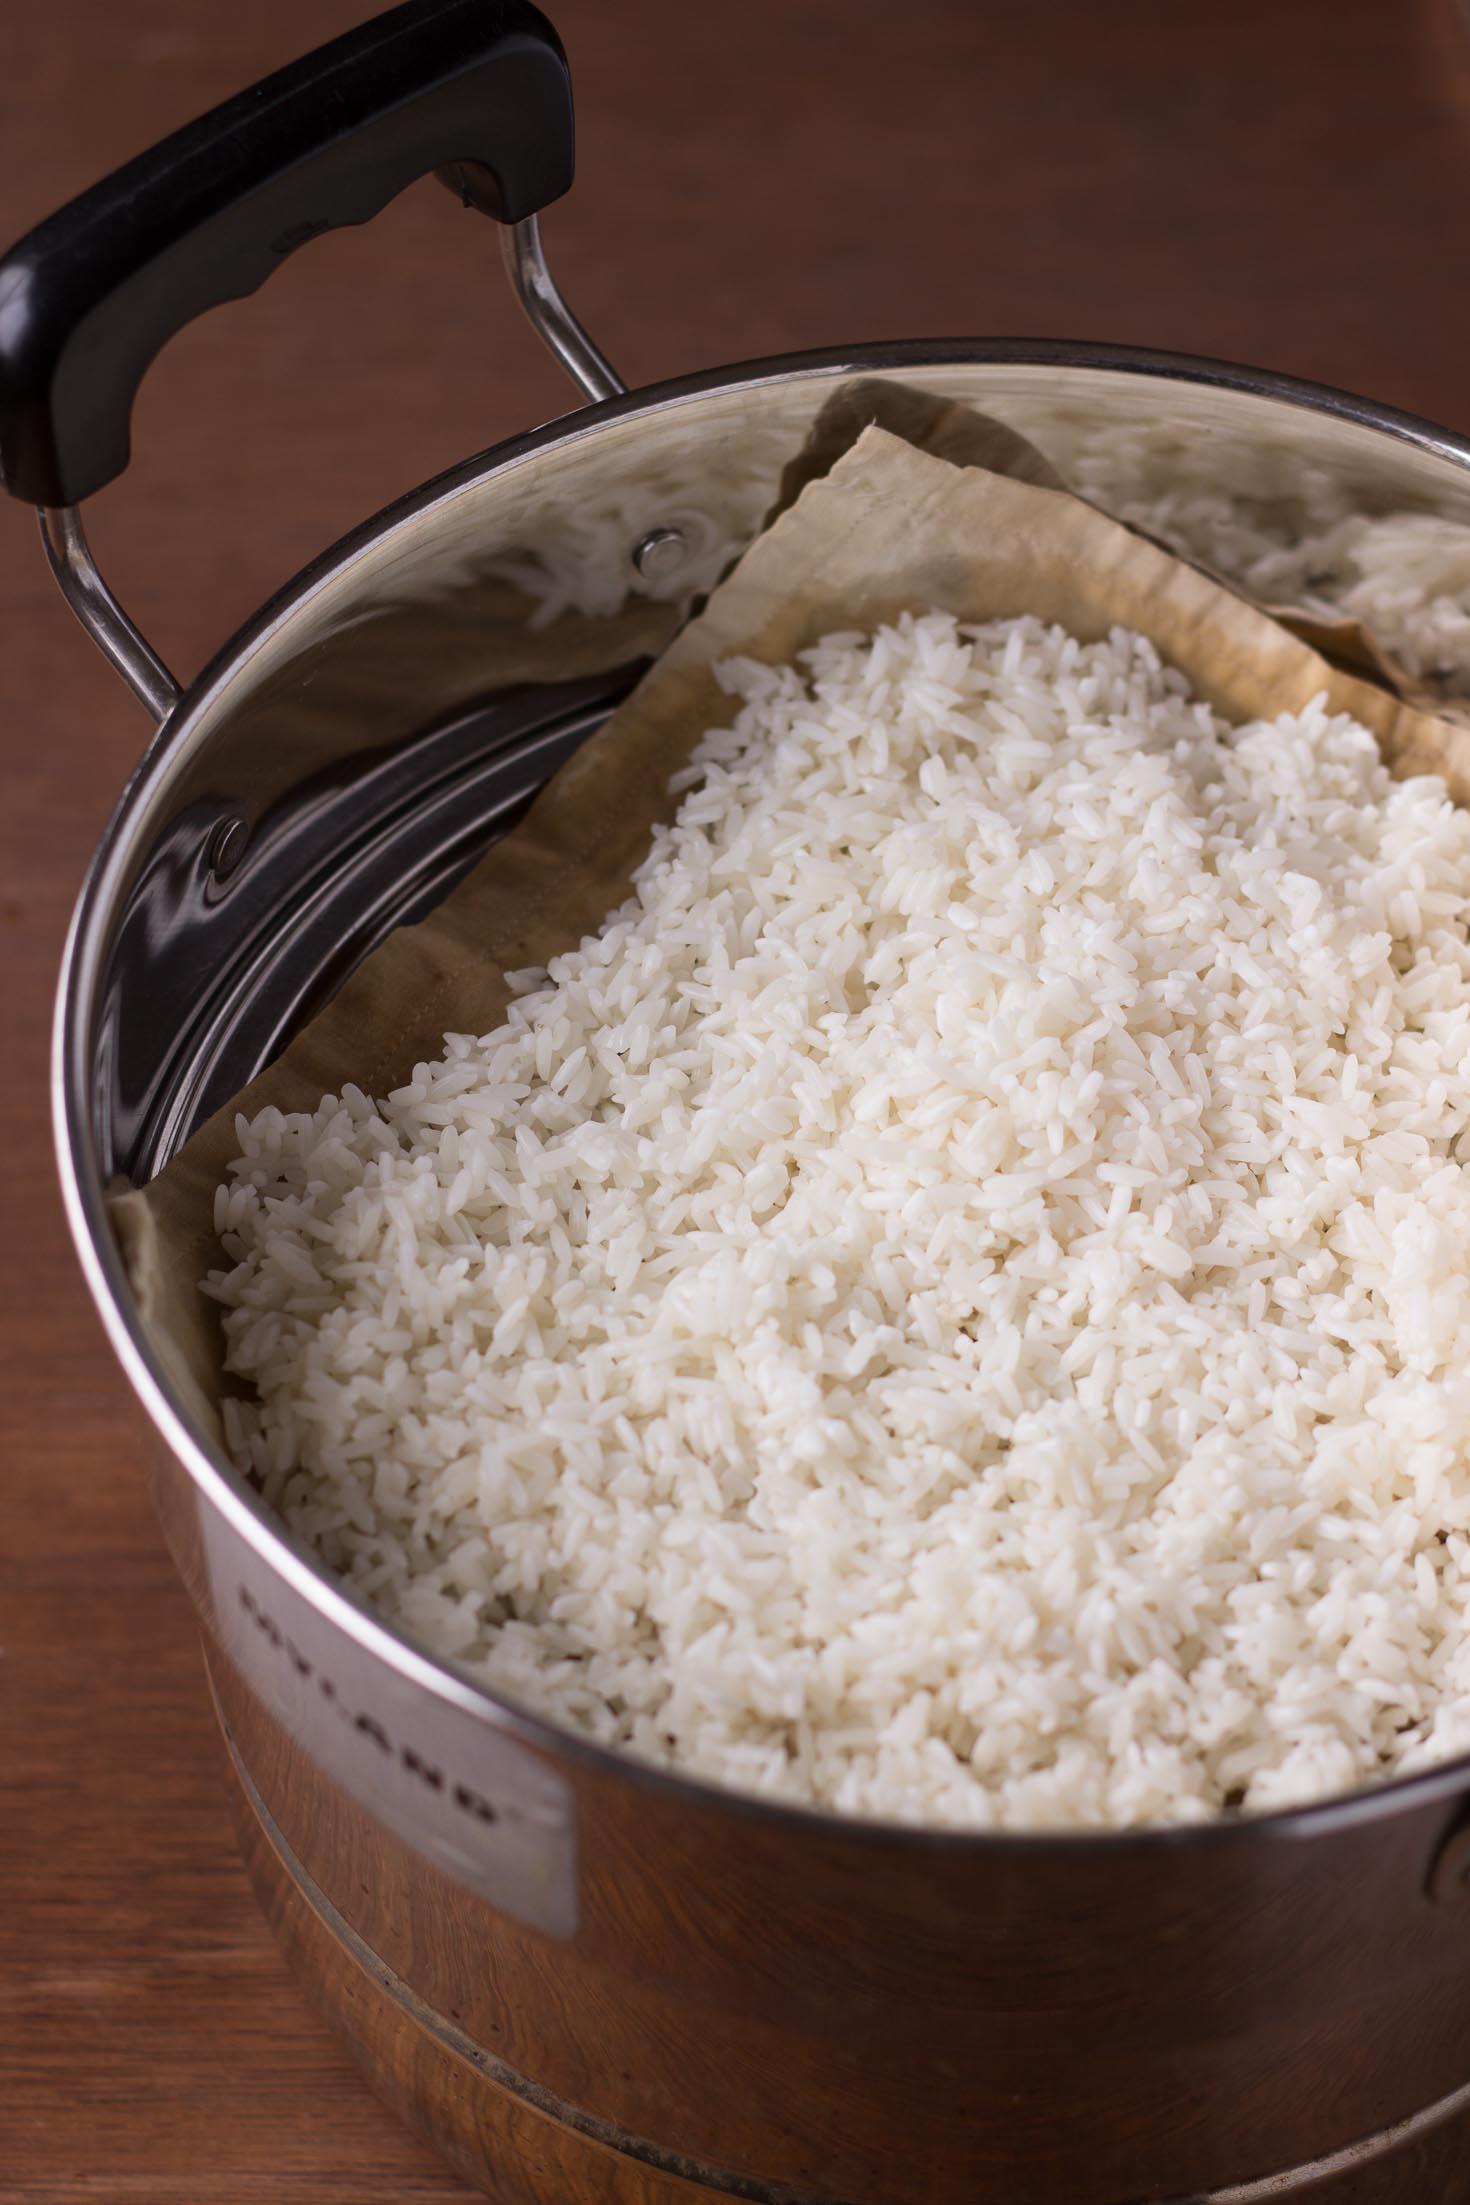 How to Make Fermented Sweet Rice (Jiuniang, Tapai)